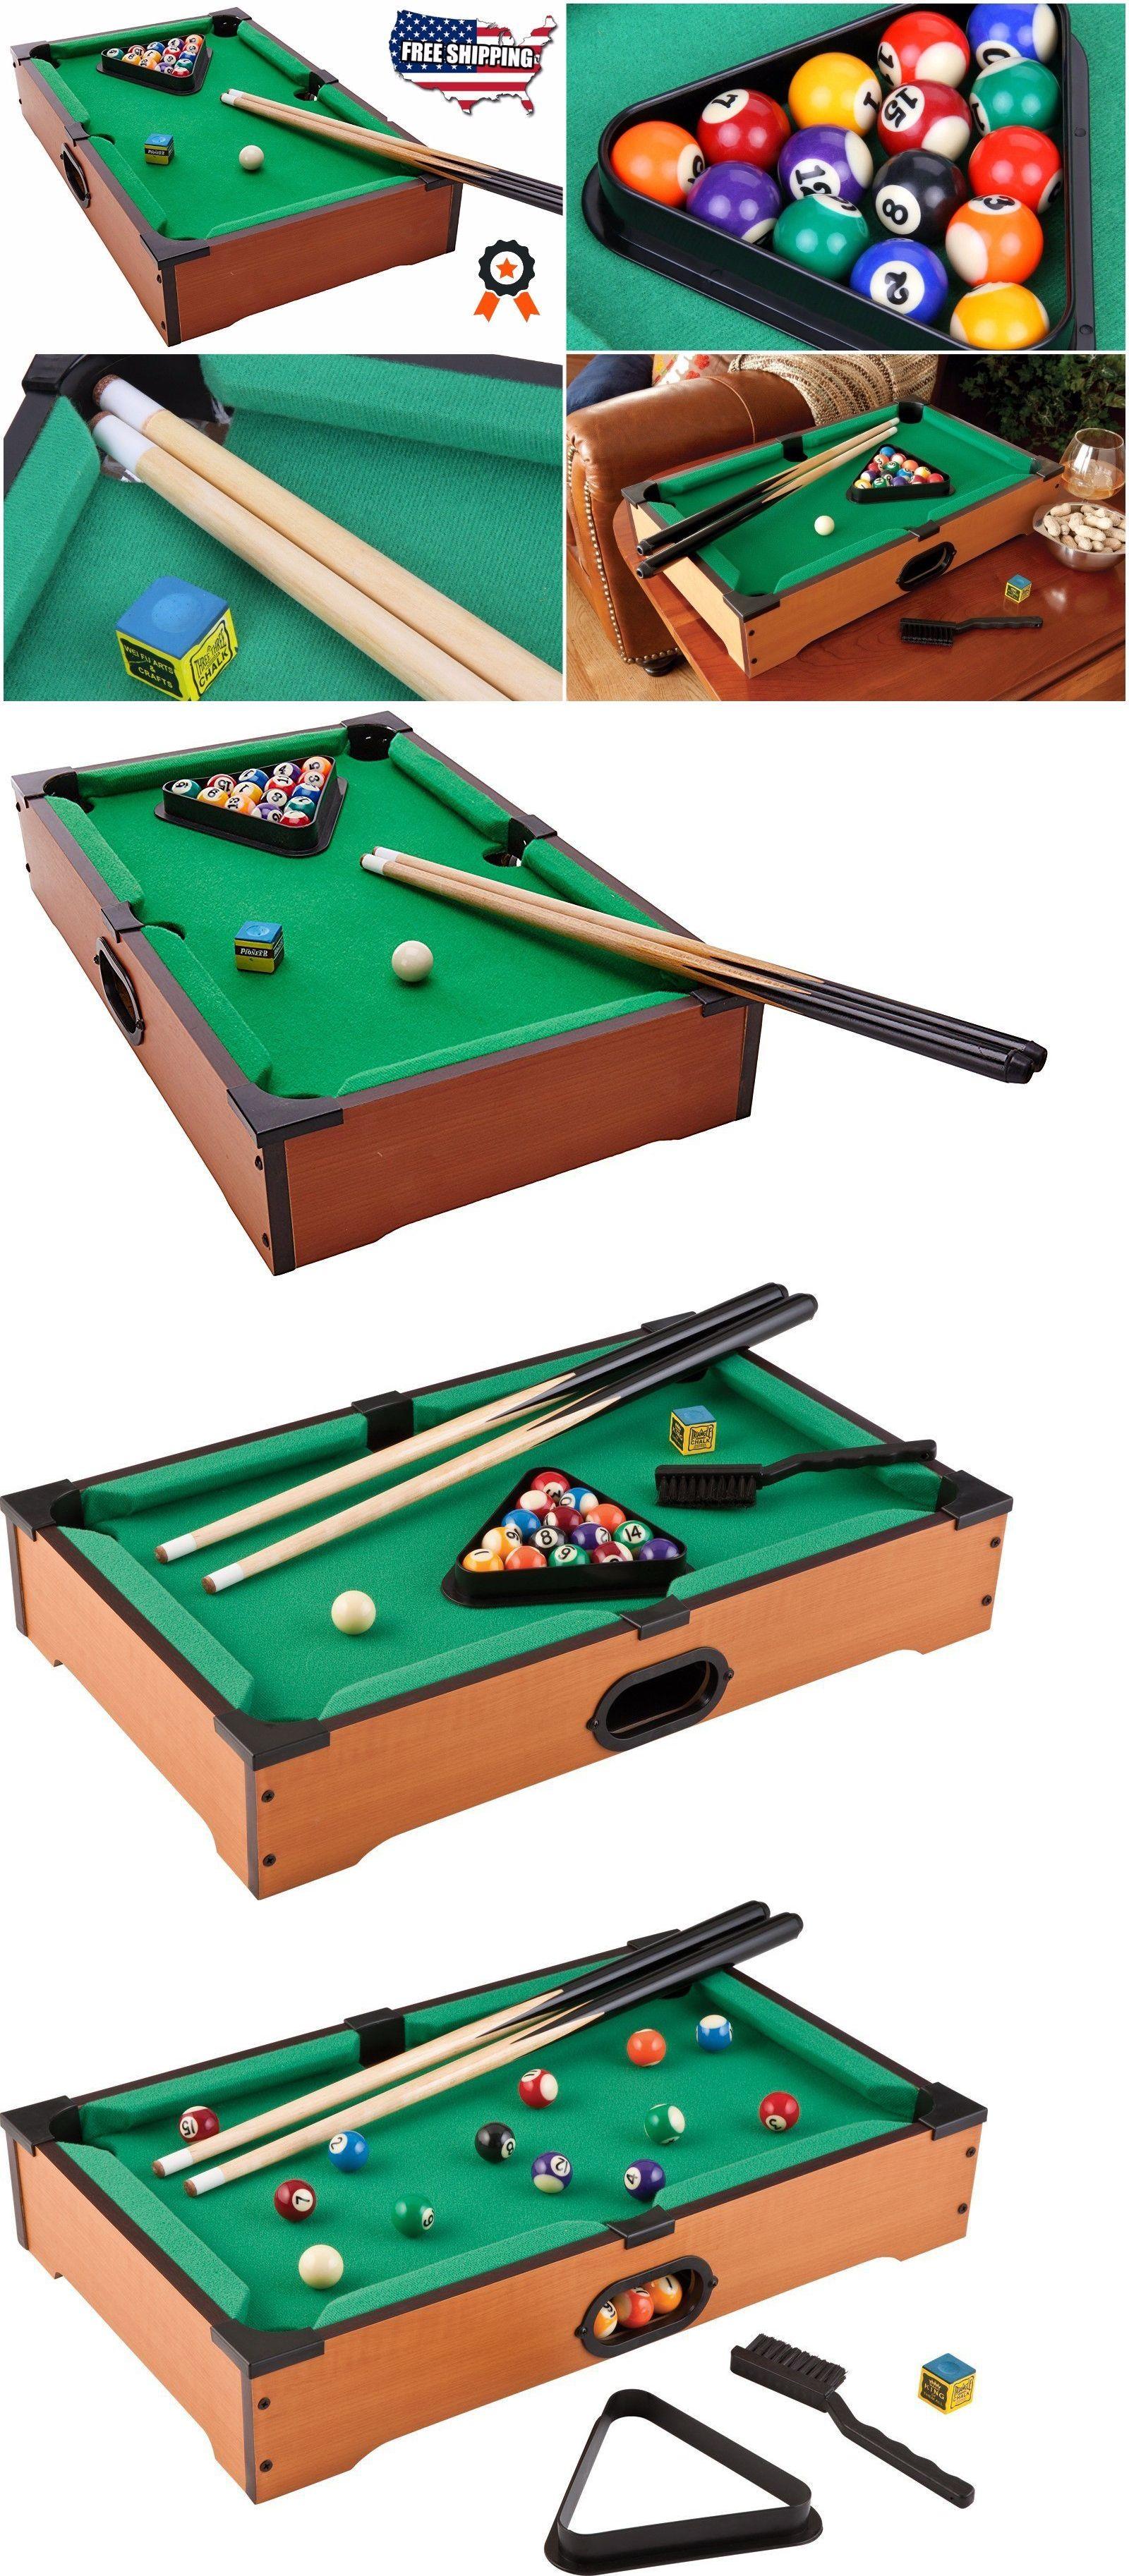 Tables 21213: Mini Pool Table Game Set Tabletop Billiards Cues Balls Chalk  Billiard Portable